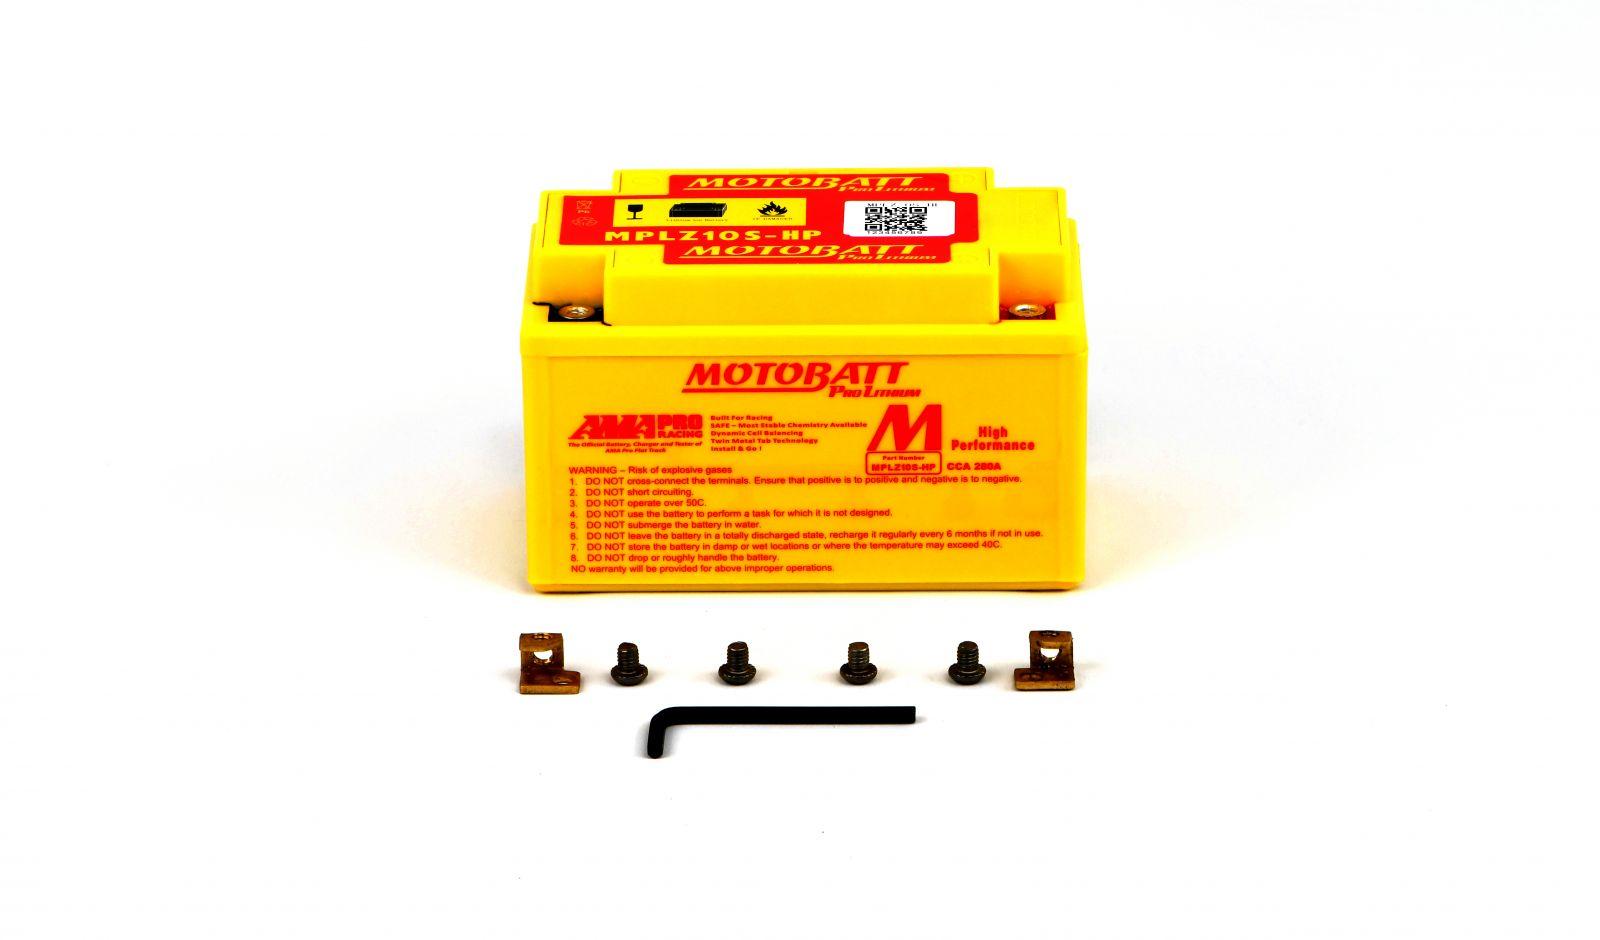 Motobatt Lithium Batteries - 501107MR image